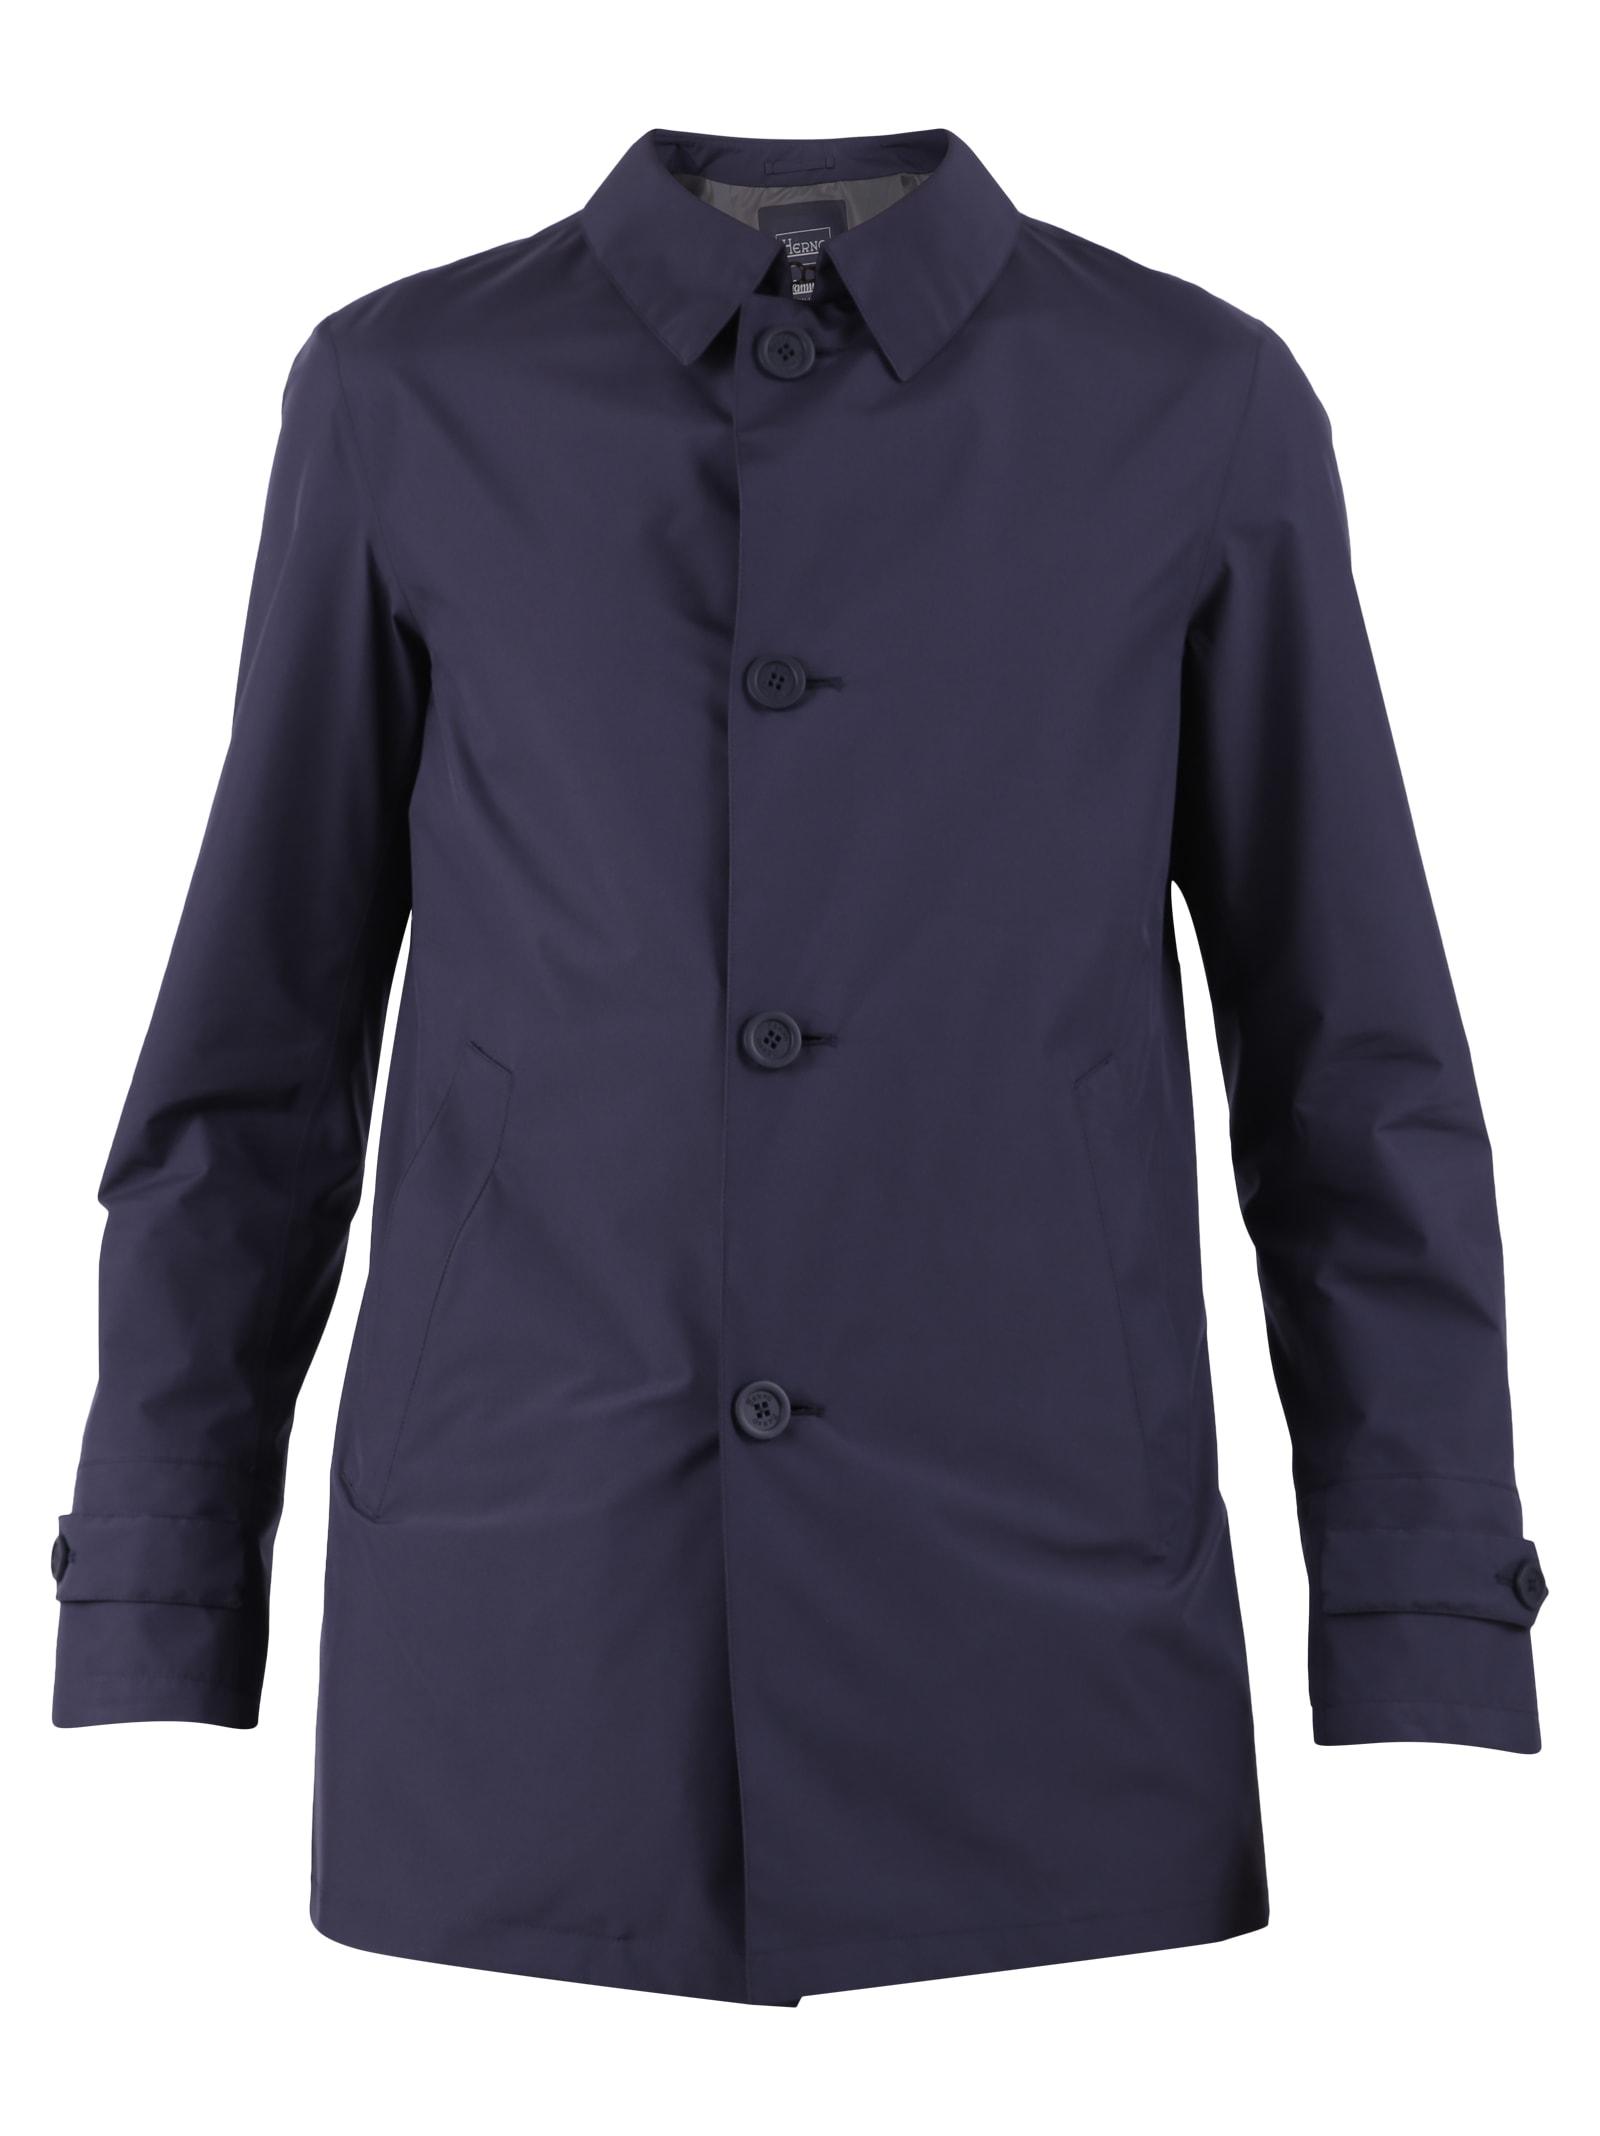 Gorotex Jacket